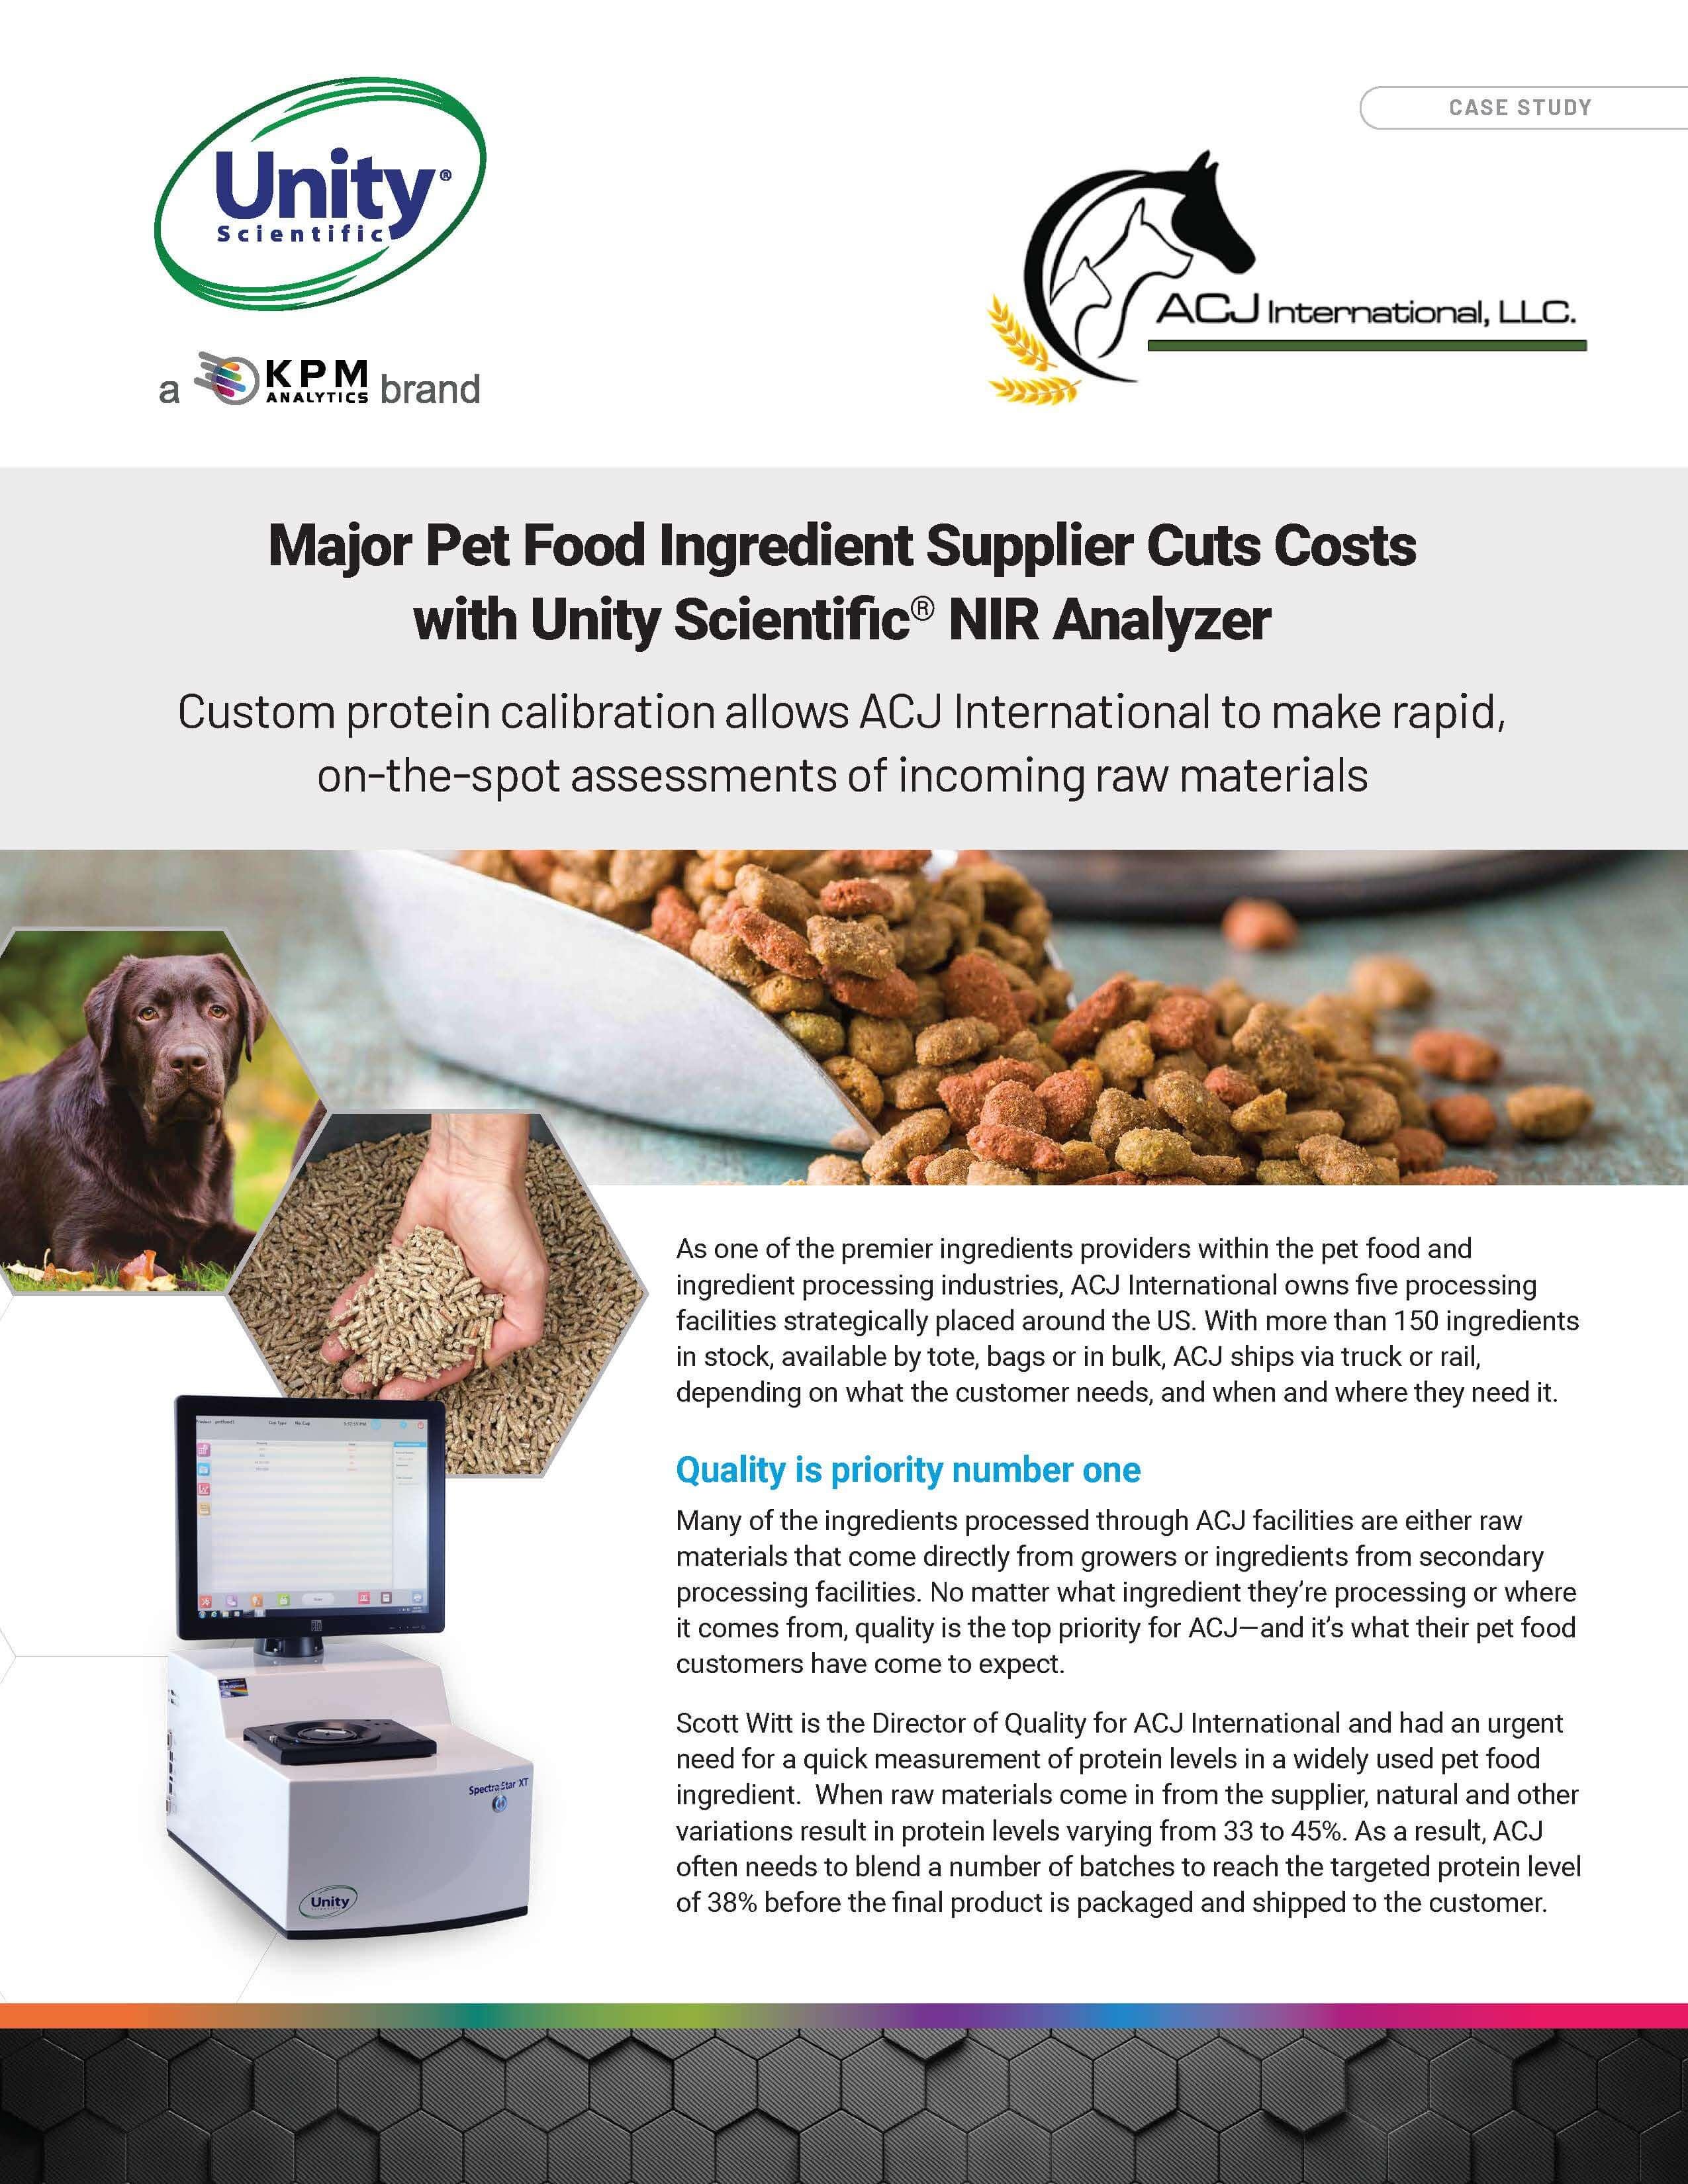 Major Pet Food Ingredient Supplier Cuts Costs  with Unity Scientific® NIR Analyzer